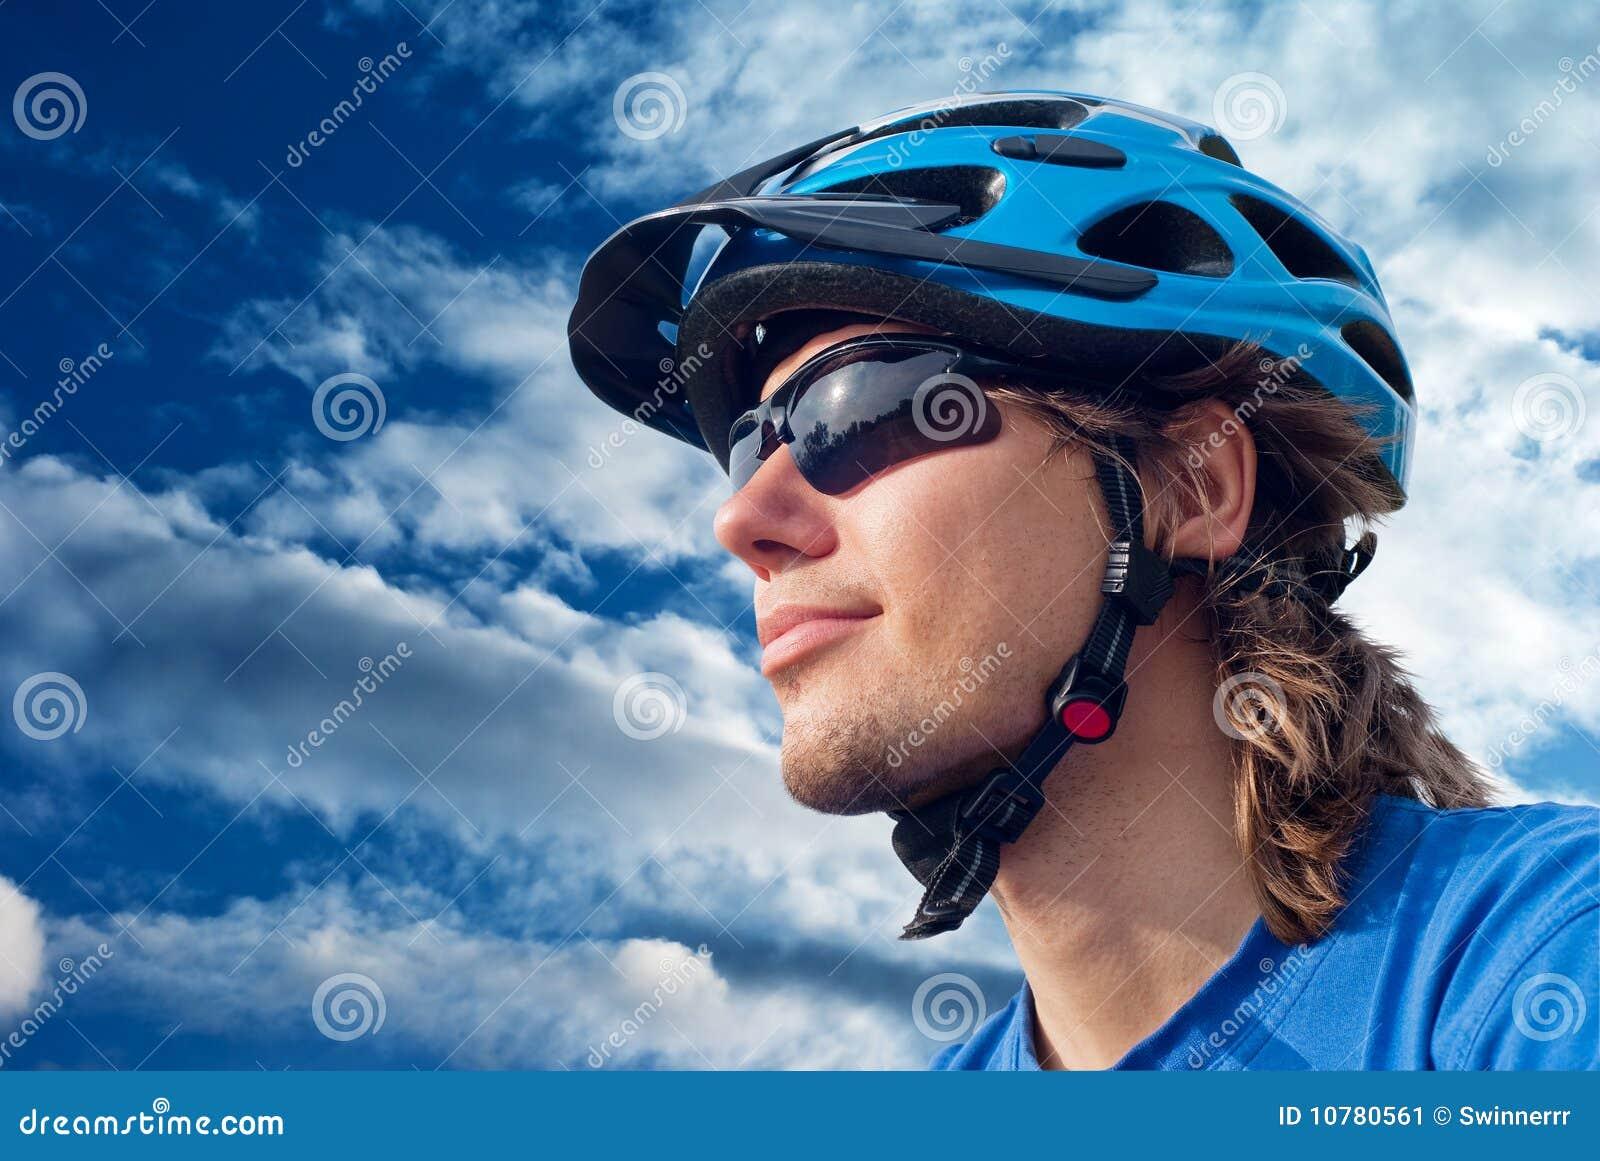 Fietser in helm en zonnebril